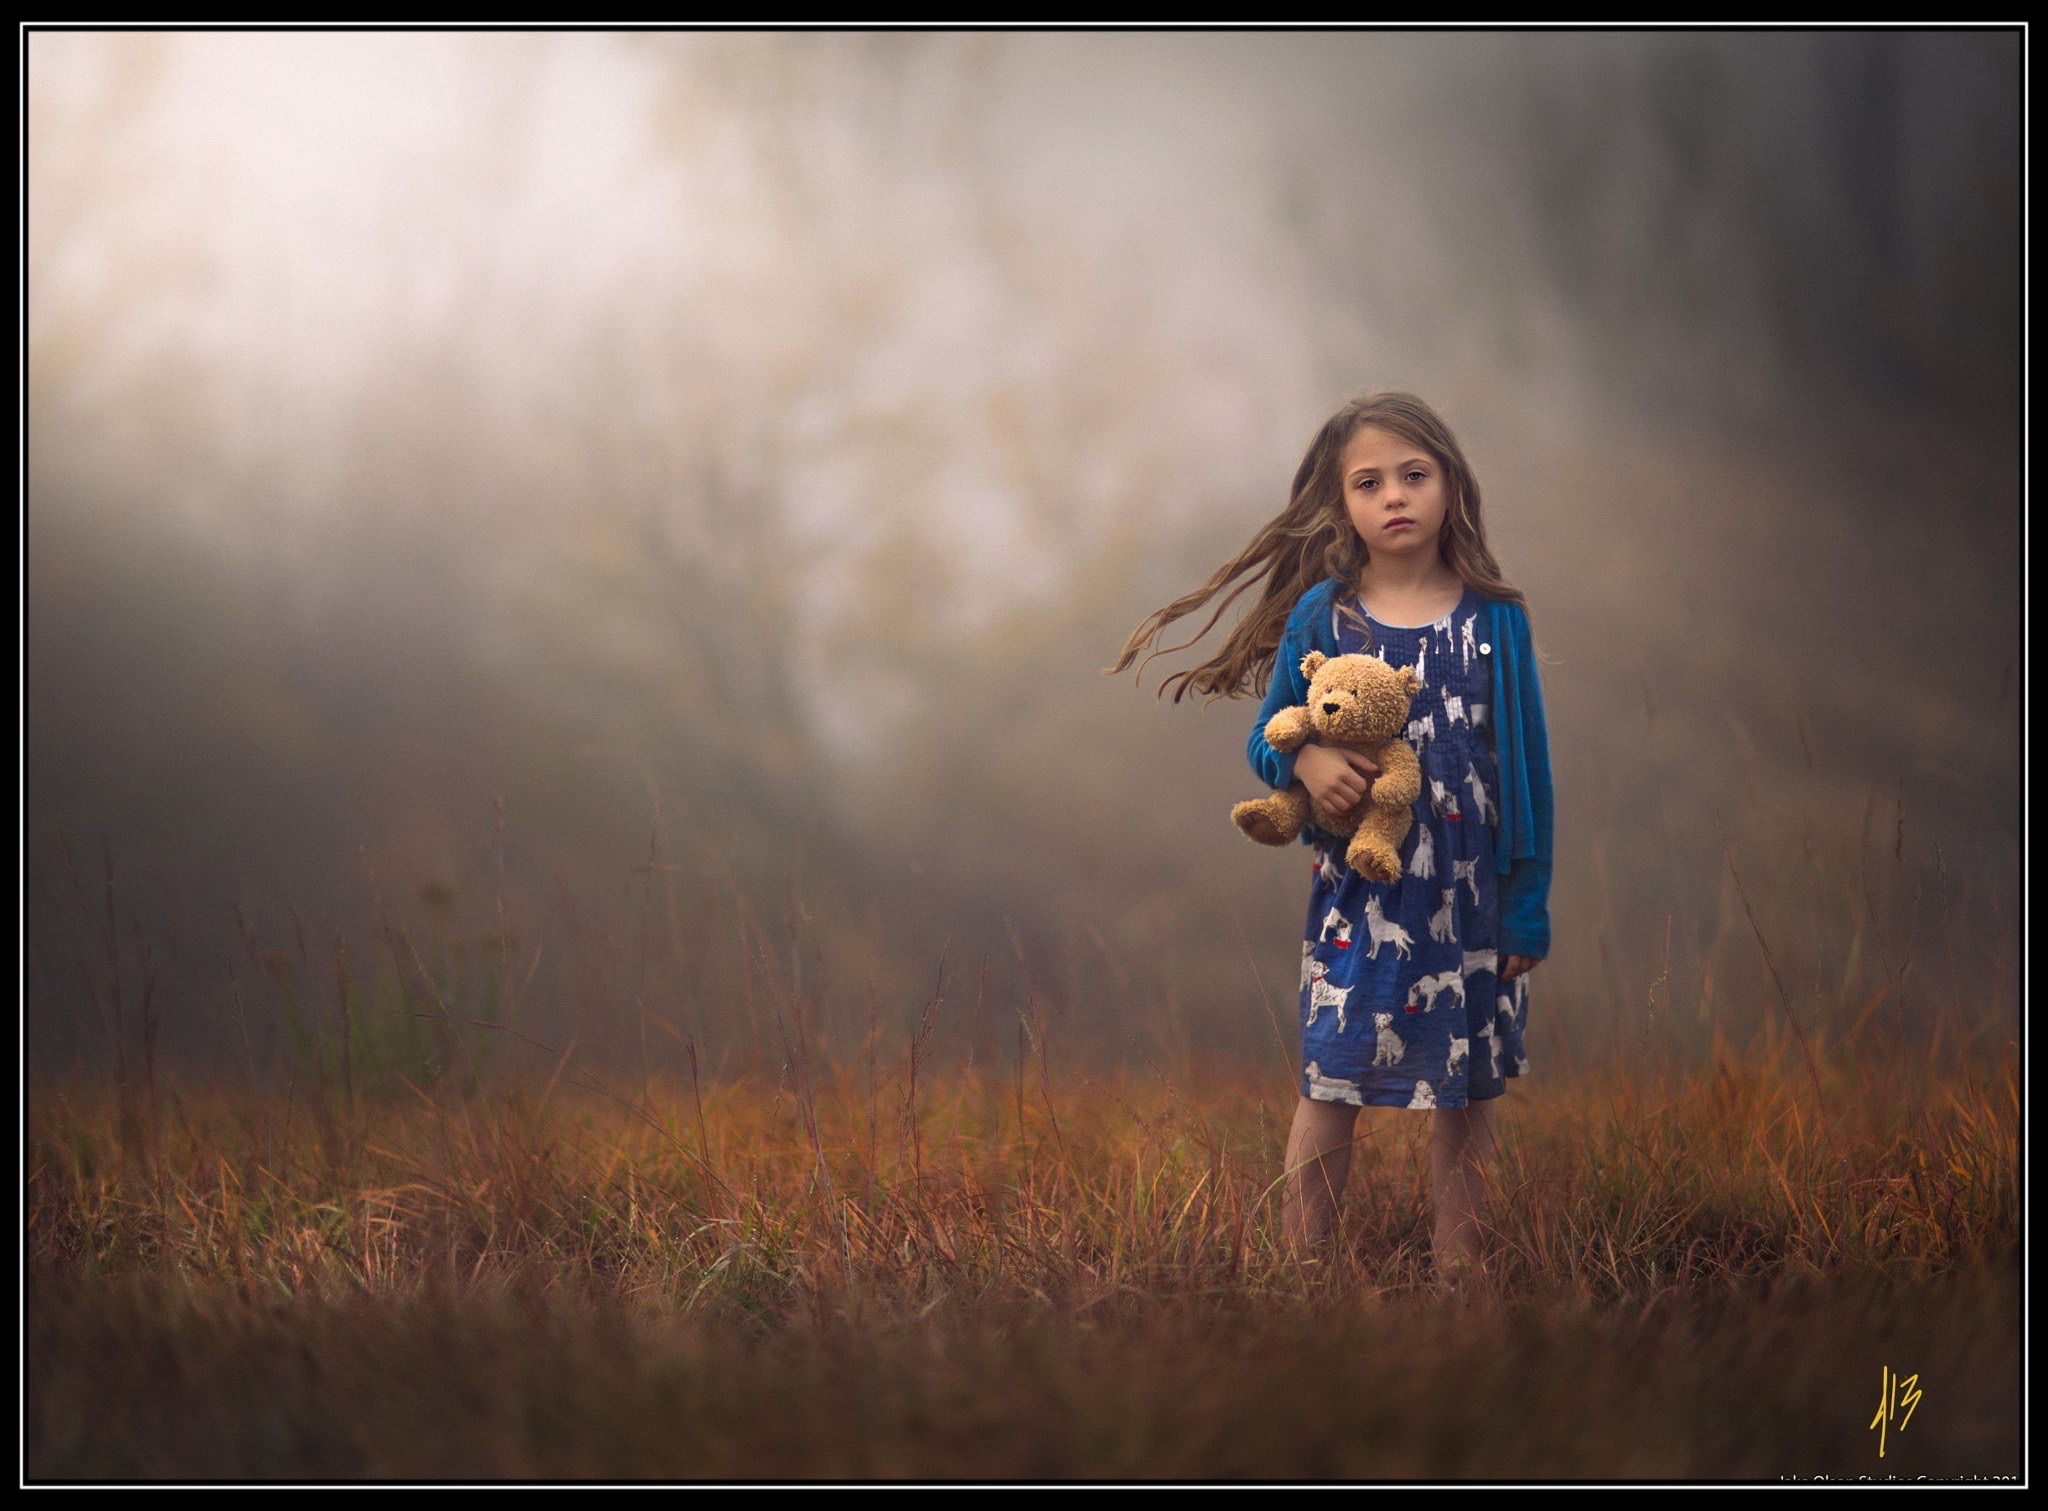 Girl Holding Teddy Bear Wallpapers ύ ί έ ά